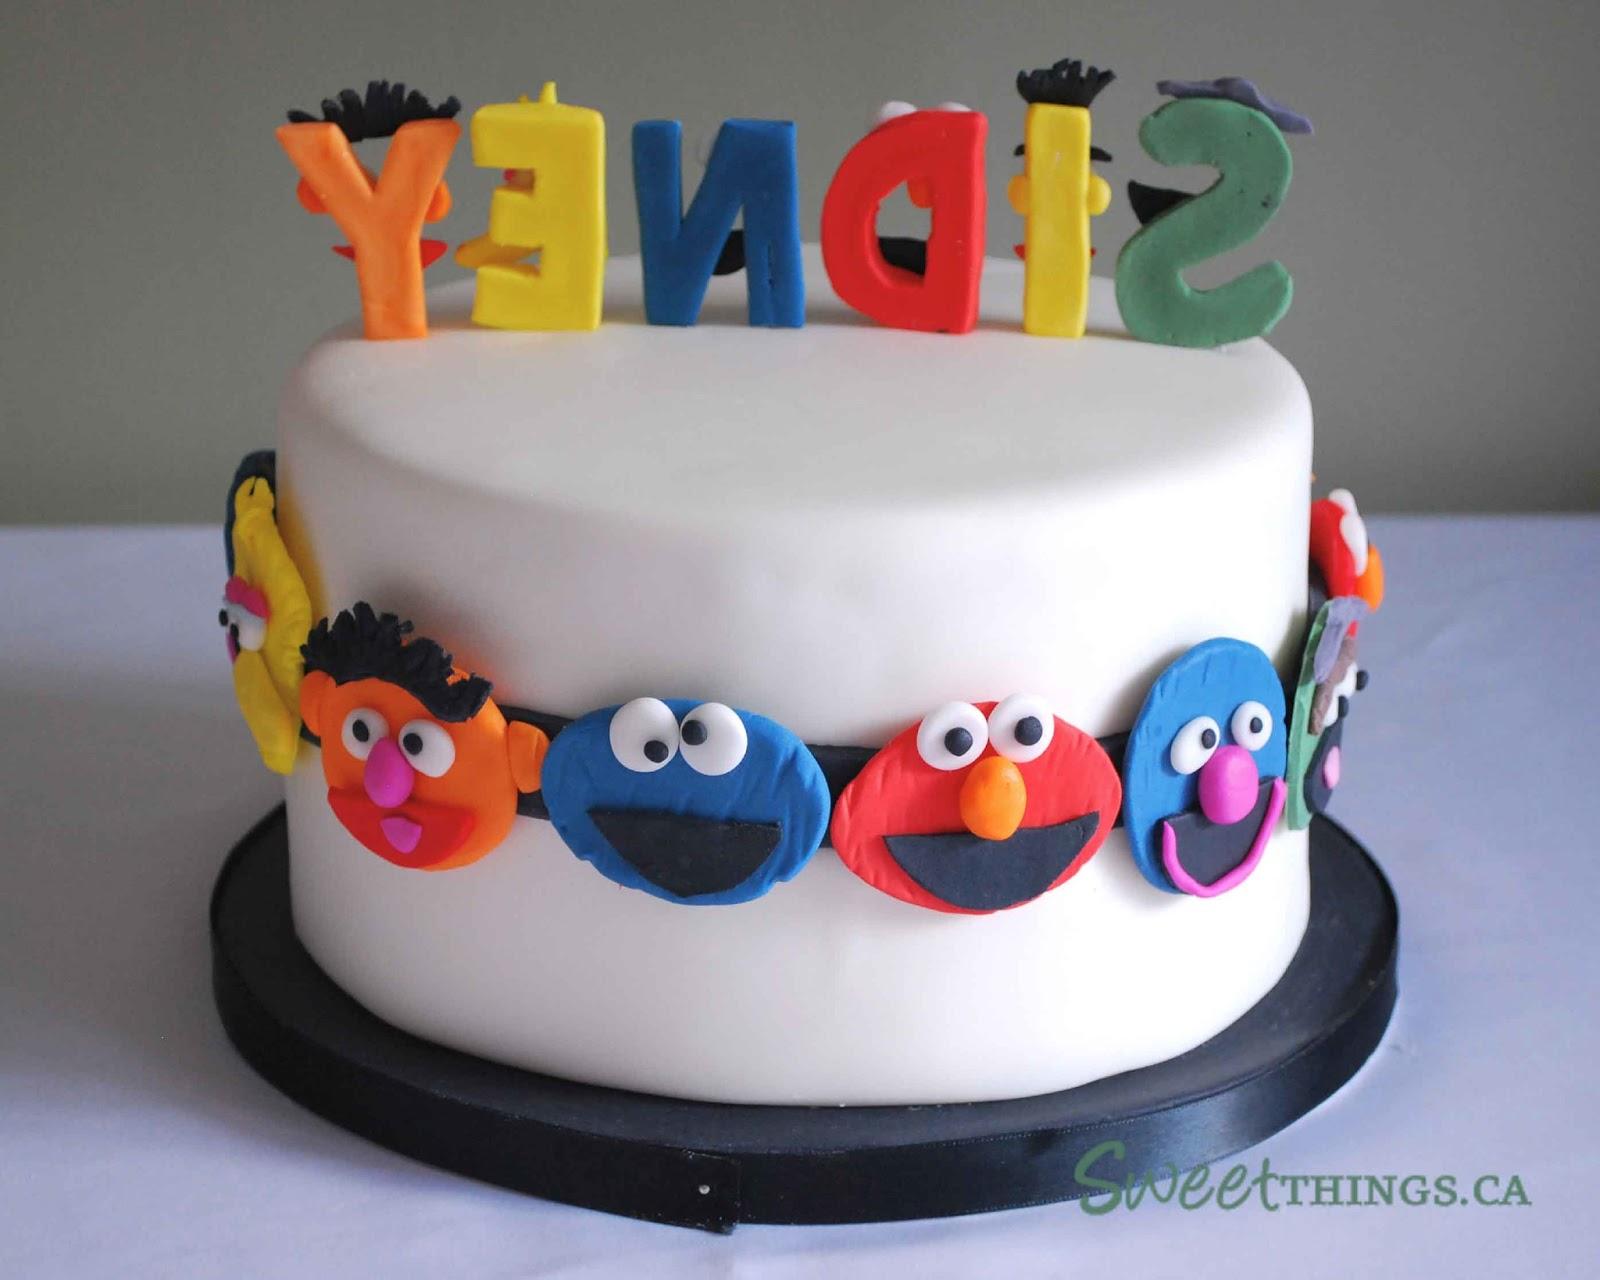 Cake Decorating Sesame Street Birthday : SweetThings: 2nd Birthday Cake: Sesame Street Cake